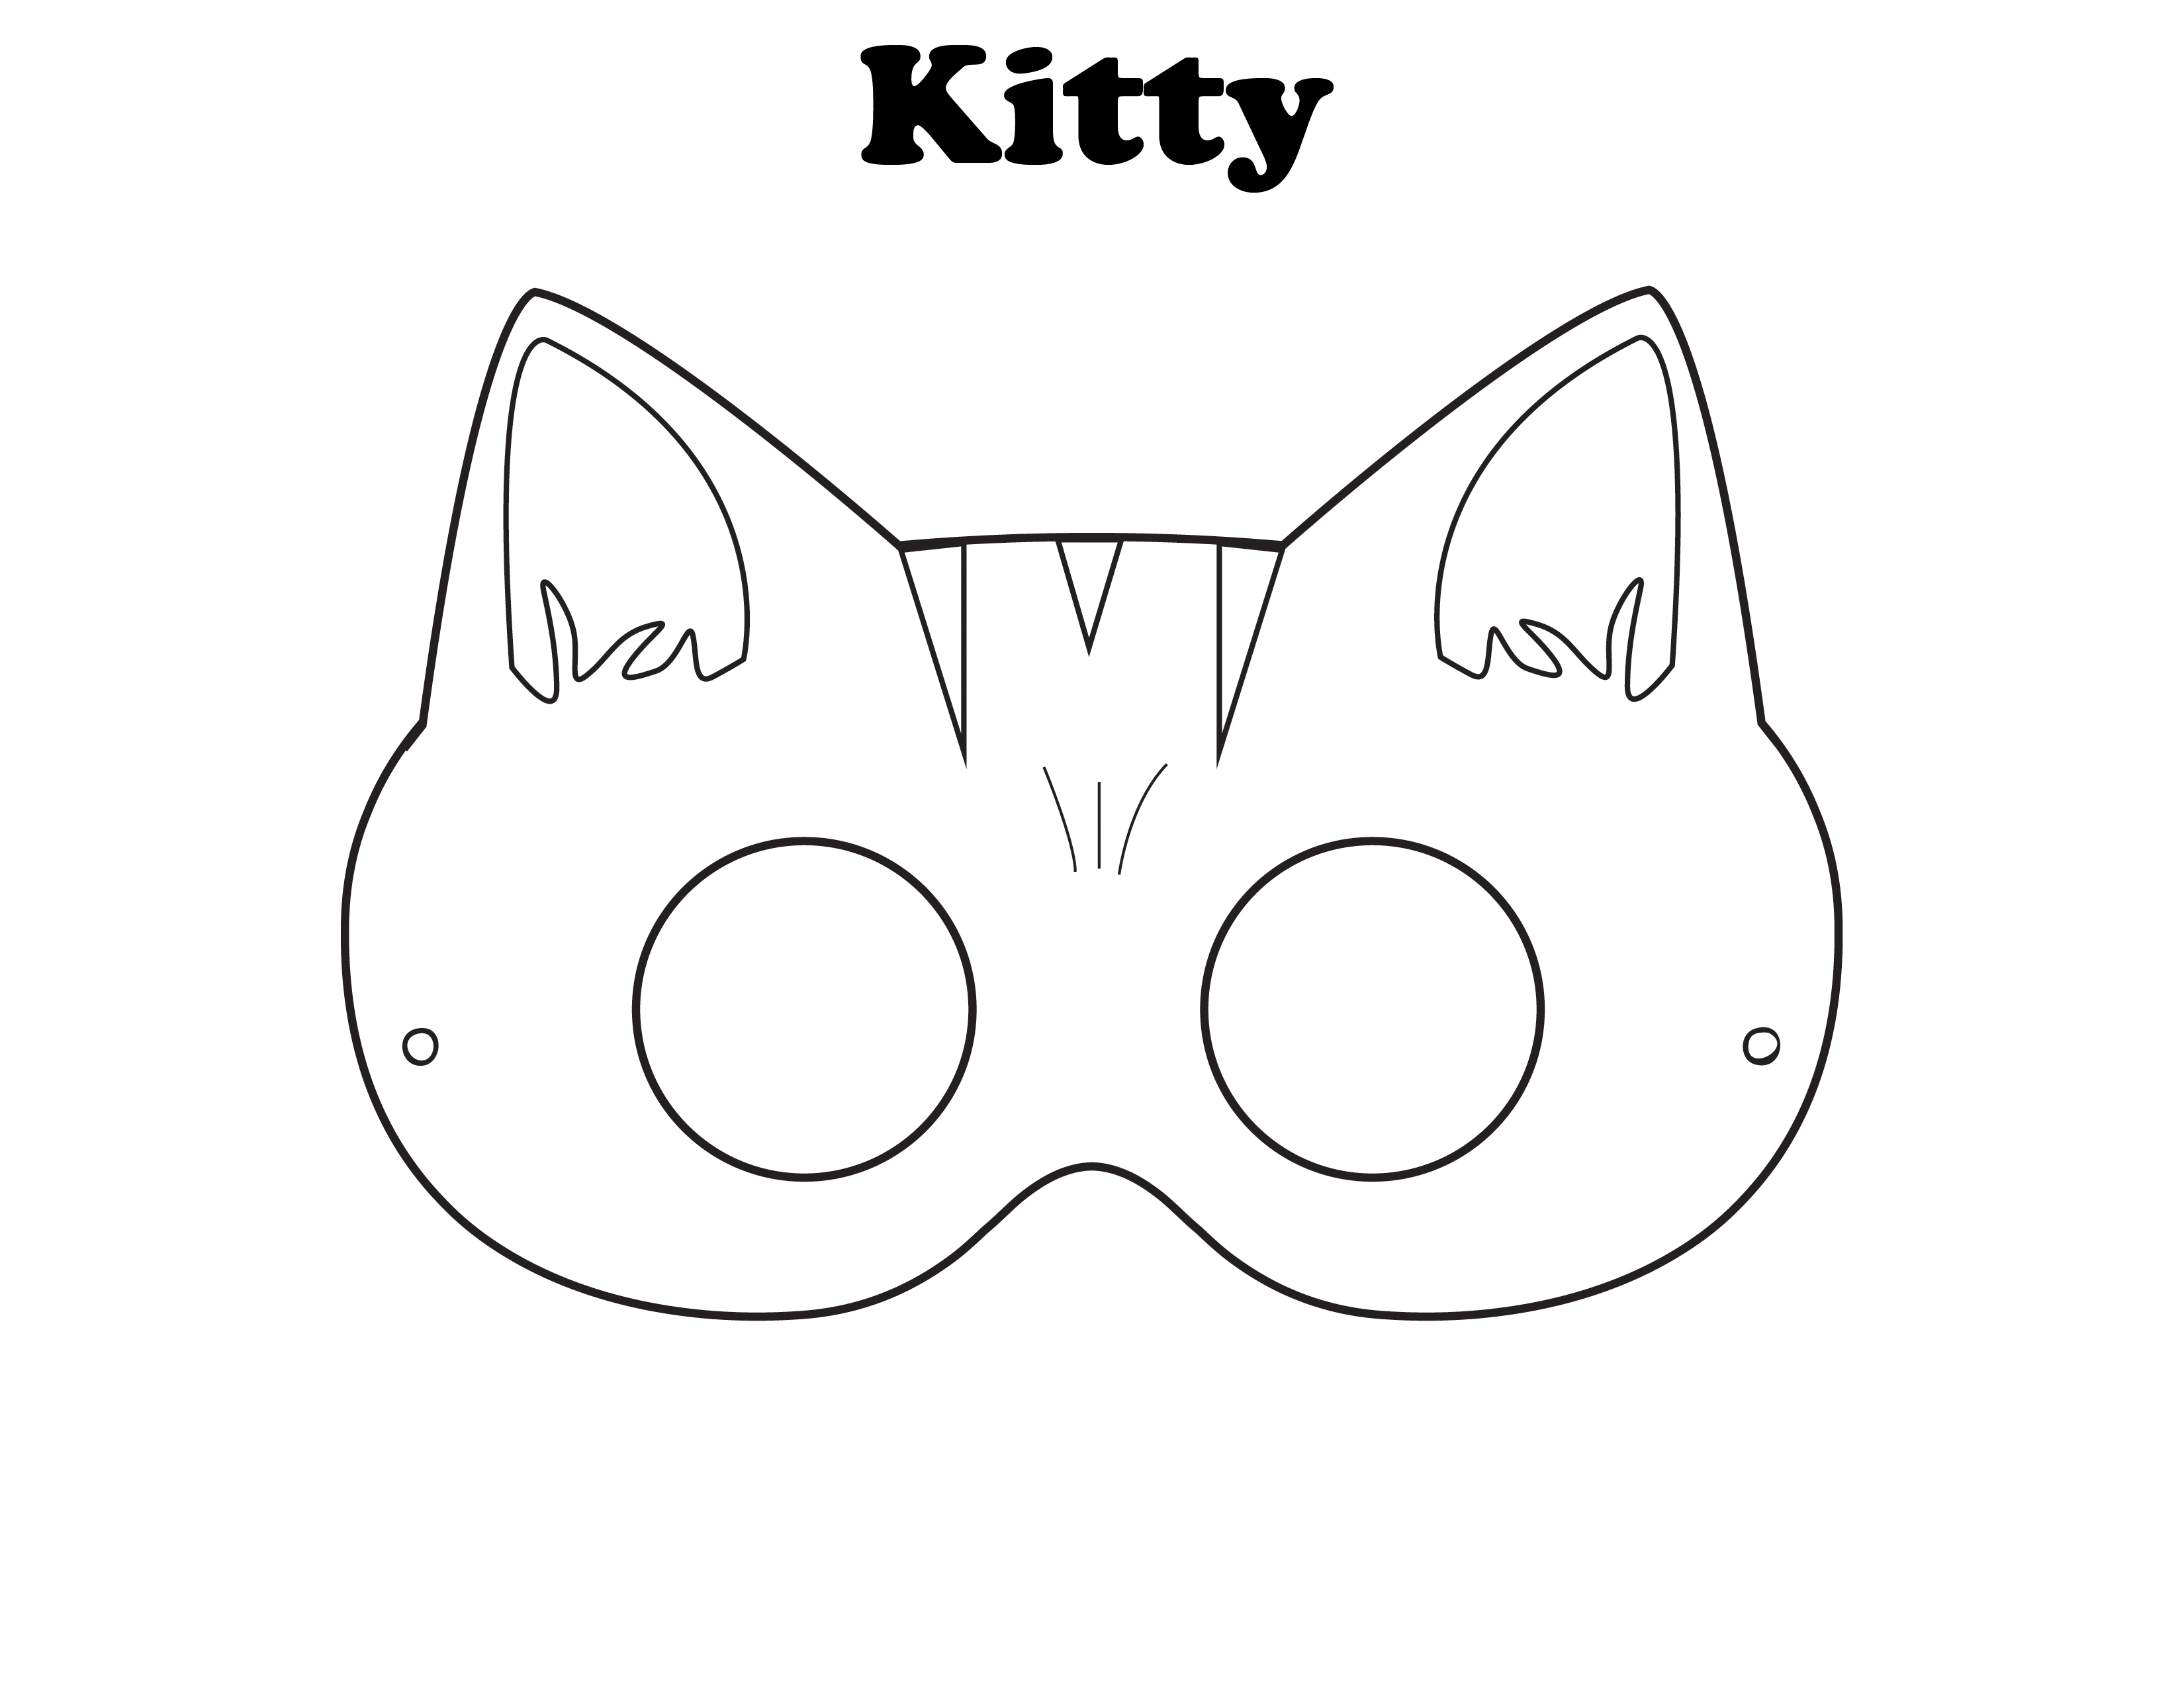 Free Printable Templates Animal Masks | Download Them Or Print - Free Printable Paper Masks